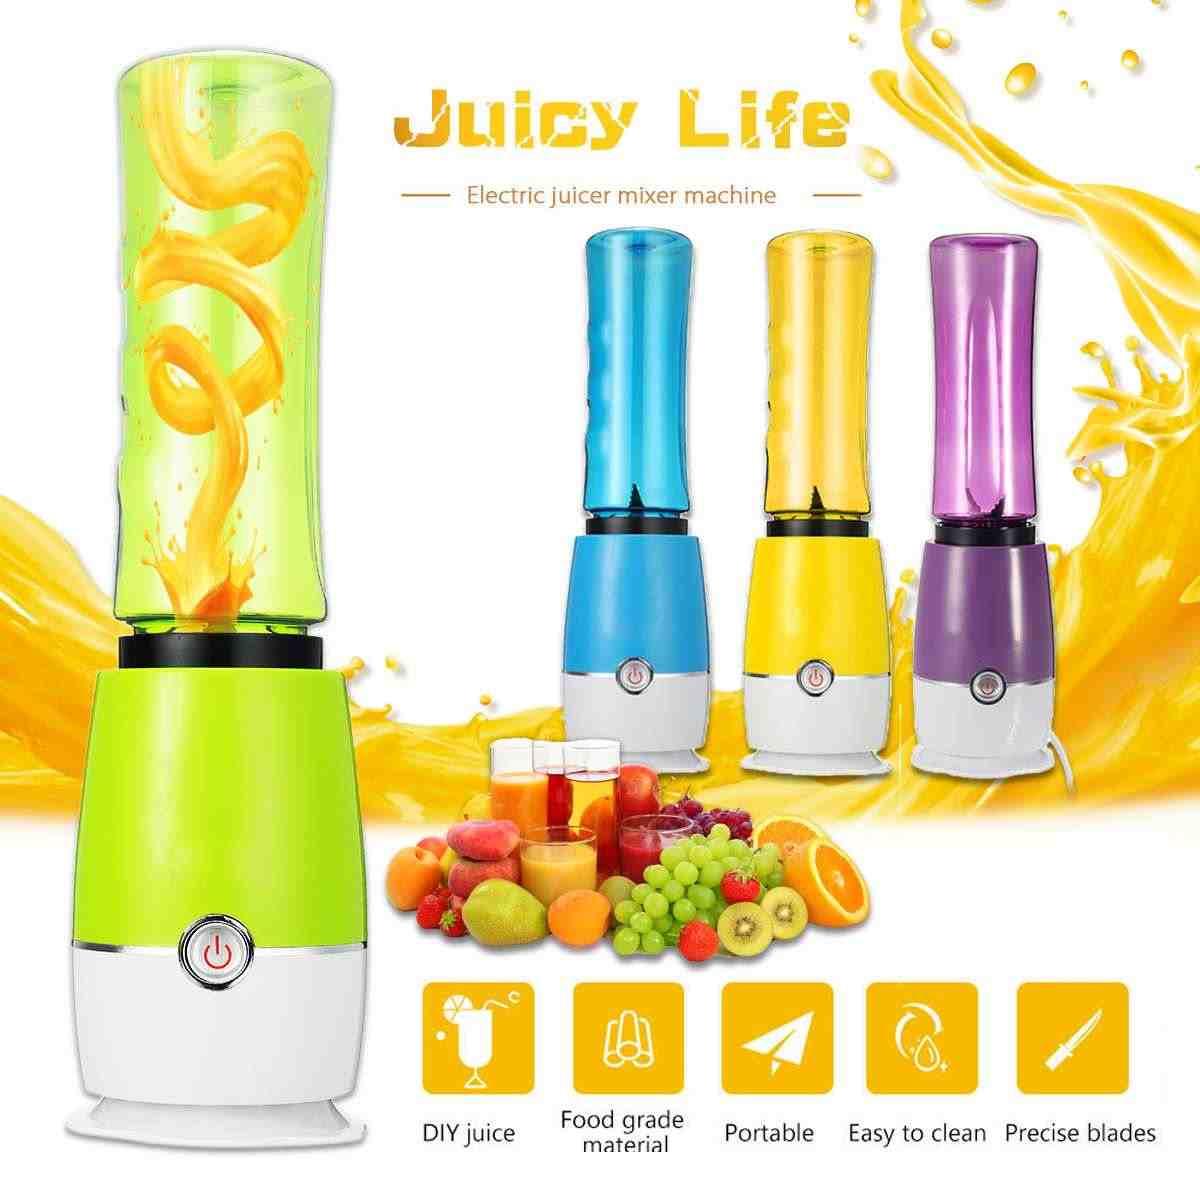 500 ML Squeezers Juicer Copa Mini Portátil Fabricante Shaker Misturador de Frutas Elétrico Extrator de Laranja Garrafa De 220 V 180 W